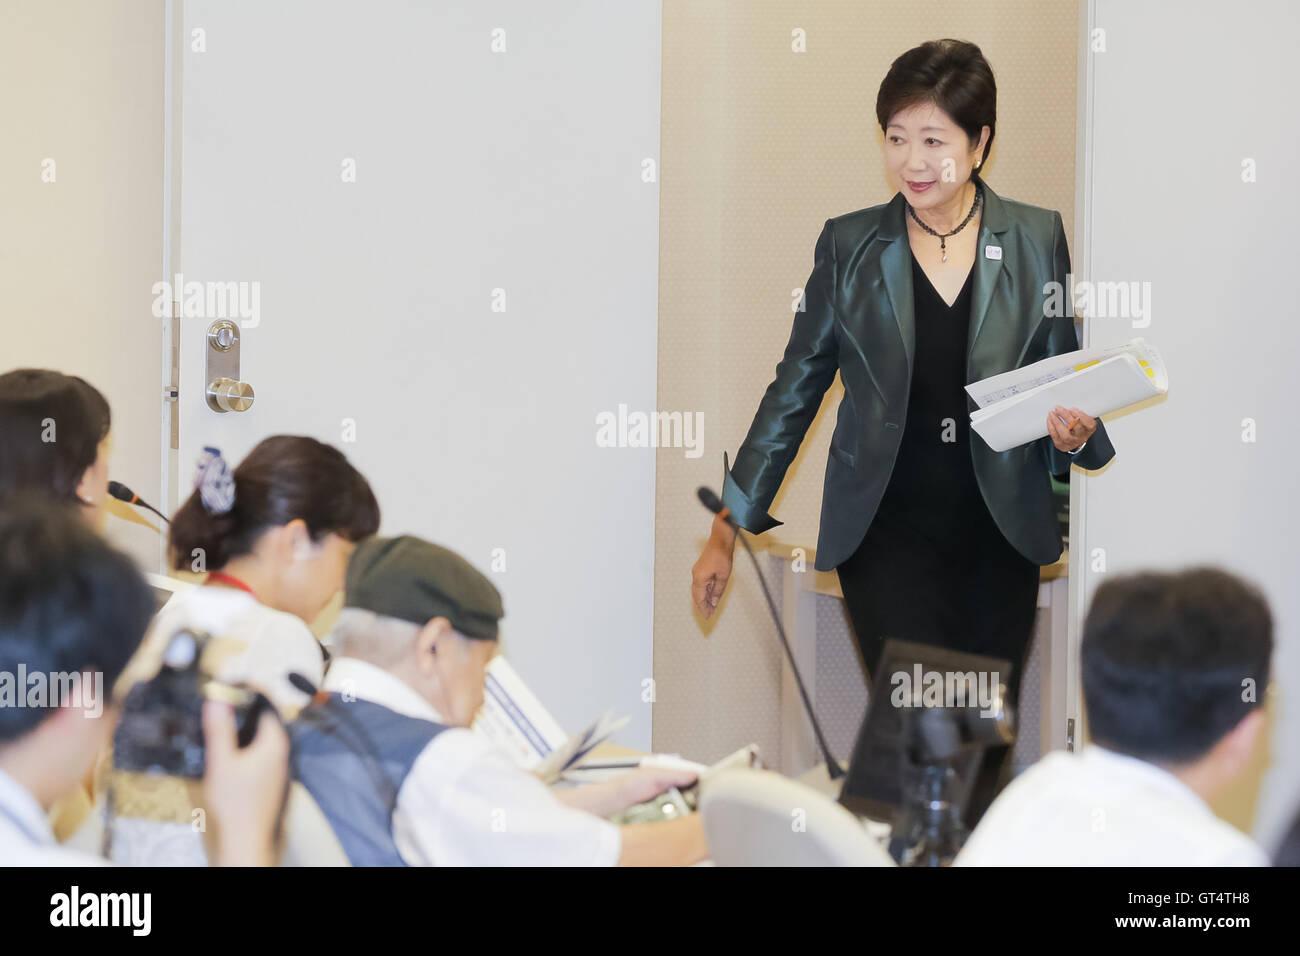 Tokyo governor Yuriko Koike attends a regular news conference at the Tokyo Metropolitan Government Building on September - Stock Image